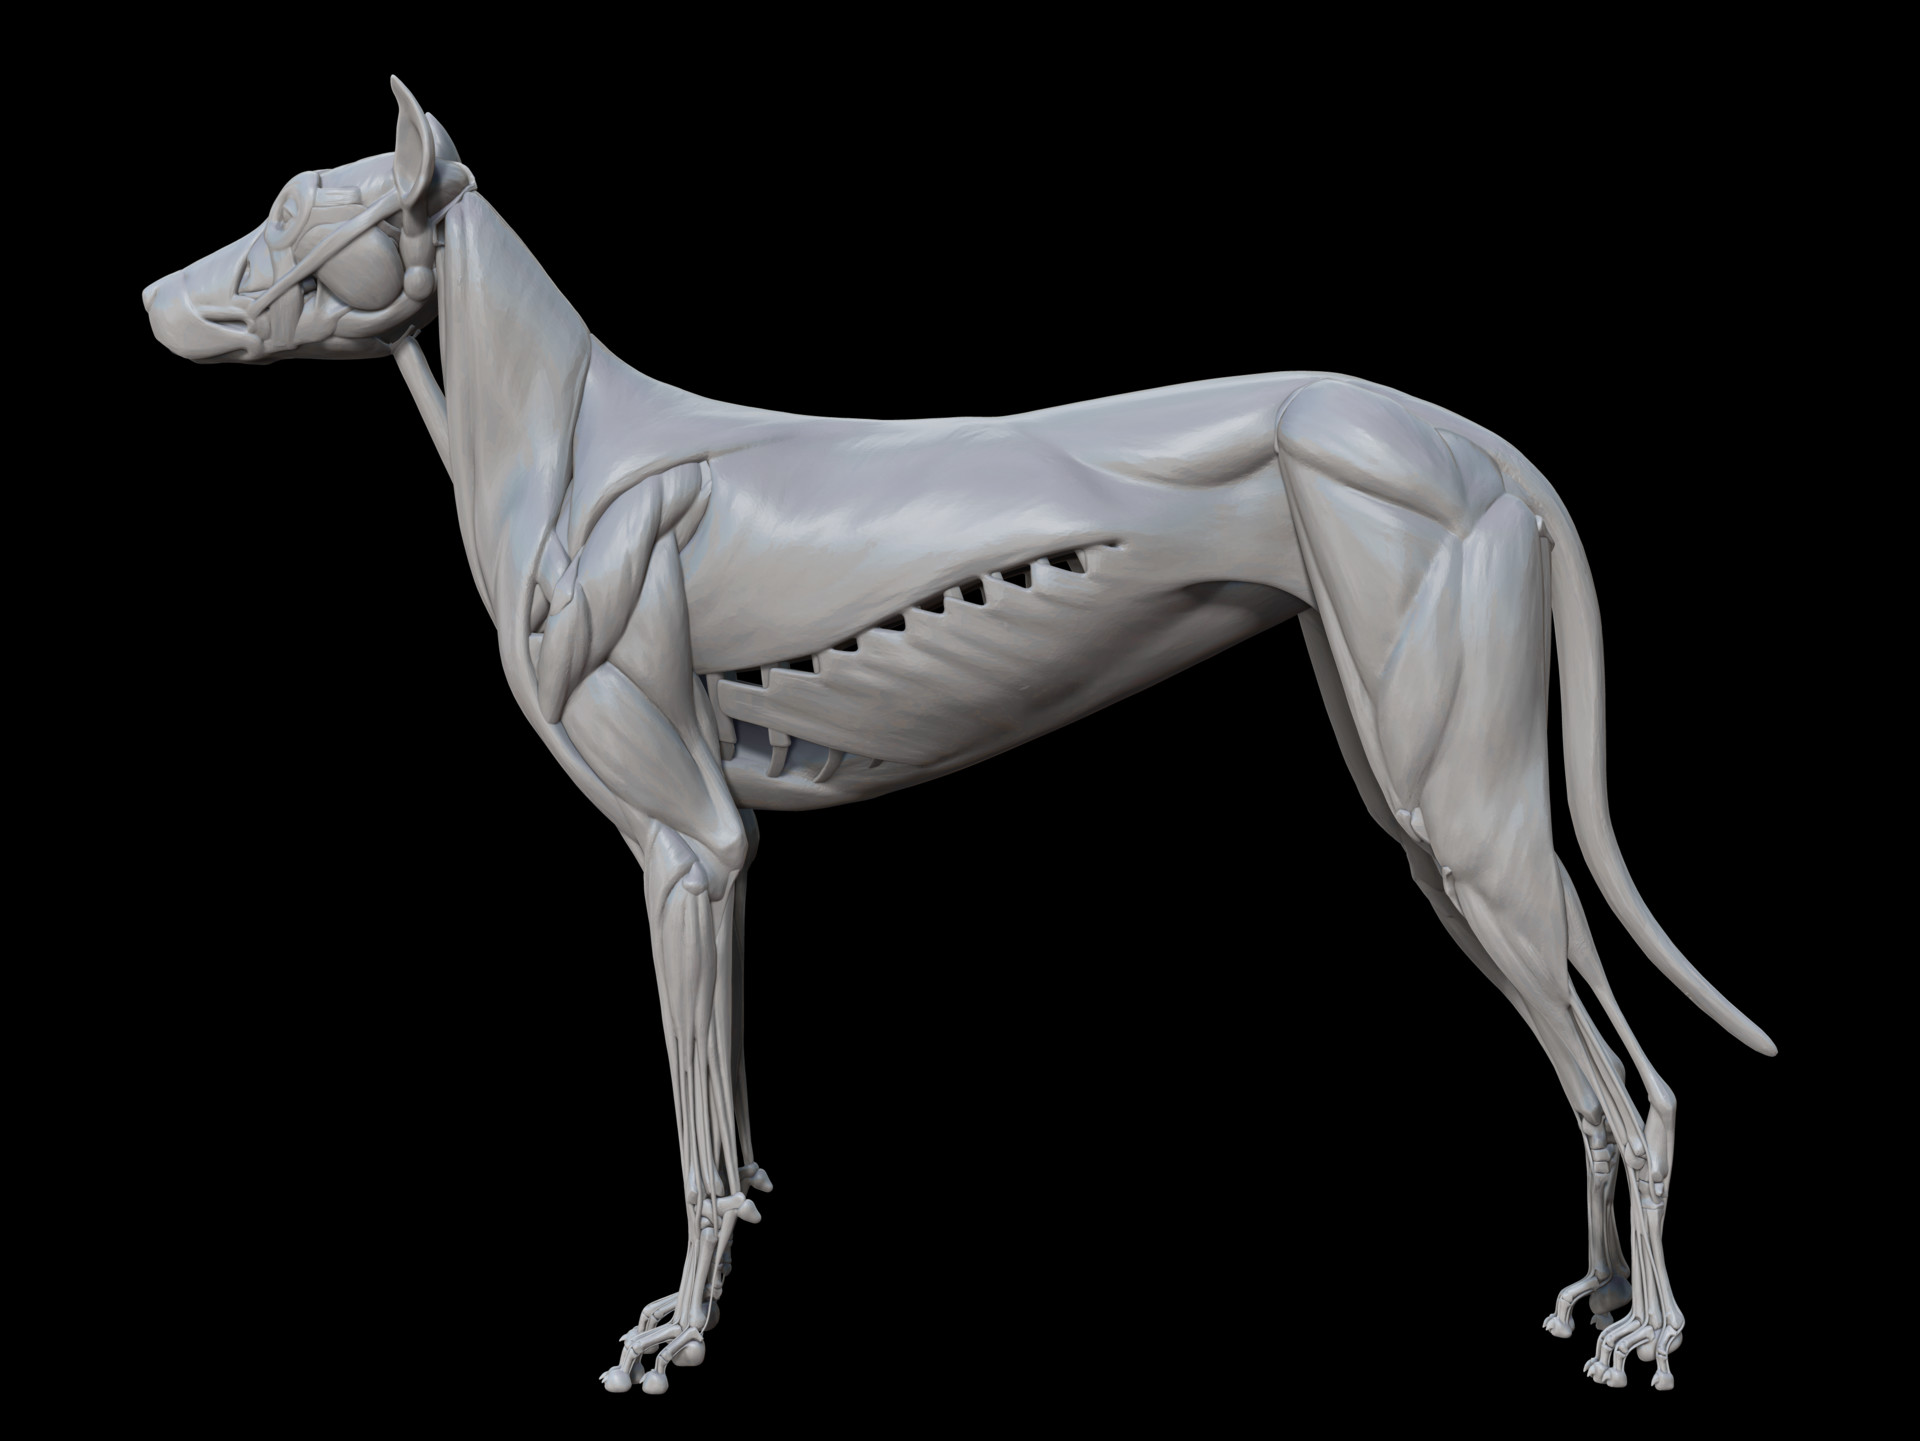 ArtStation - dog muscle, William Hamilton